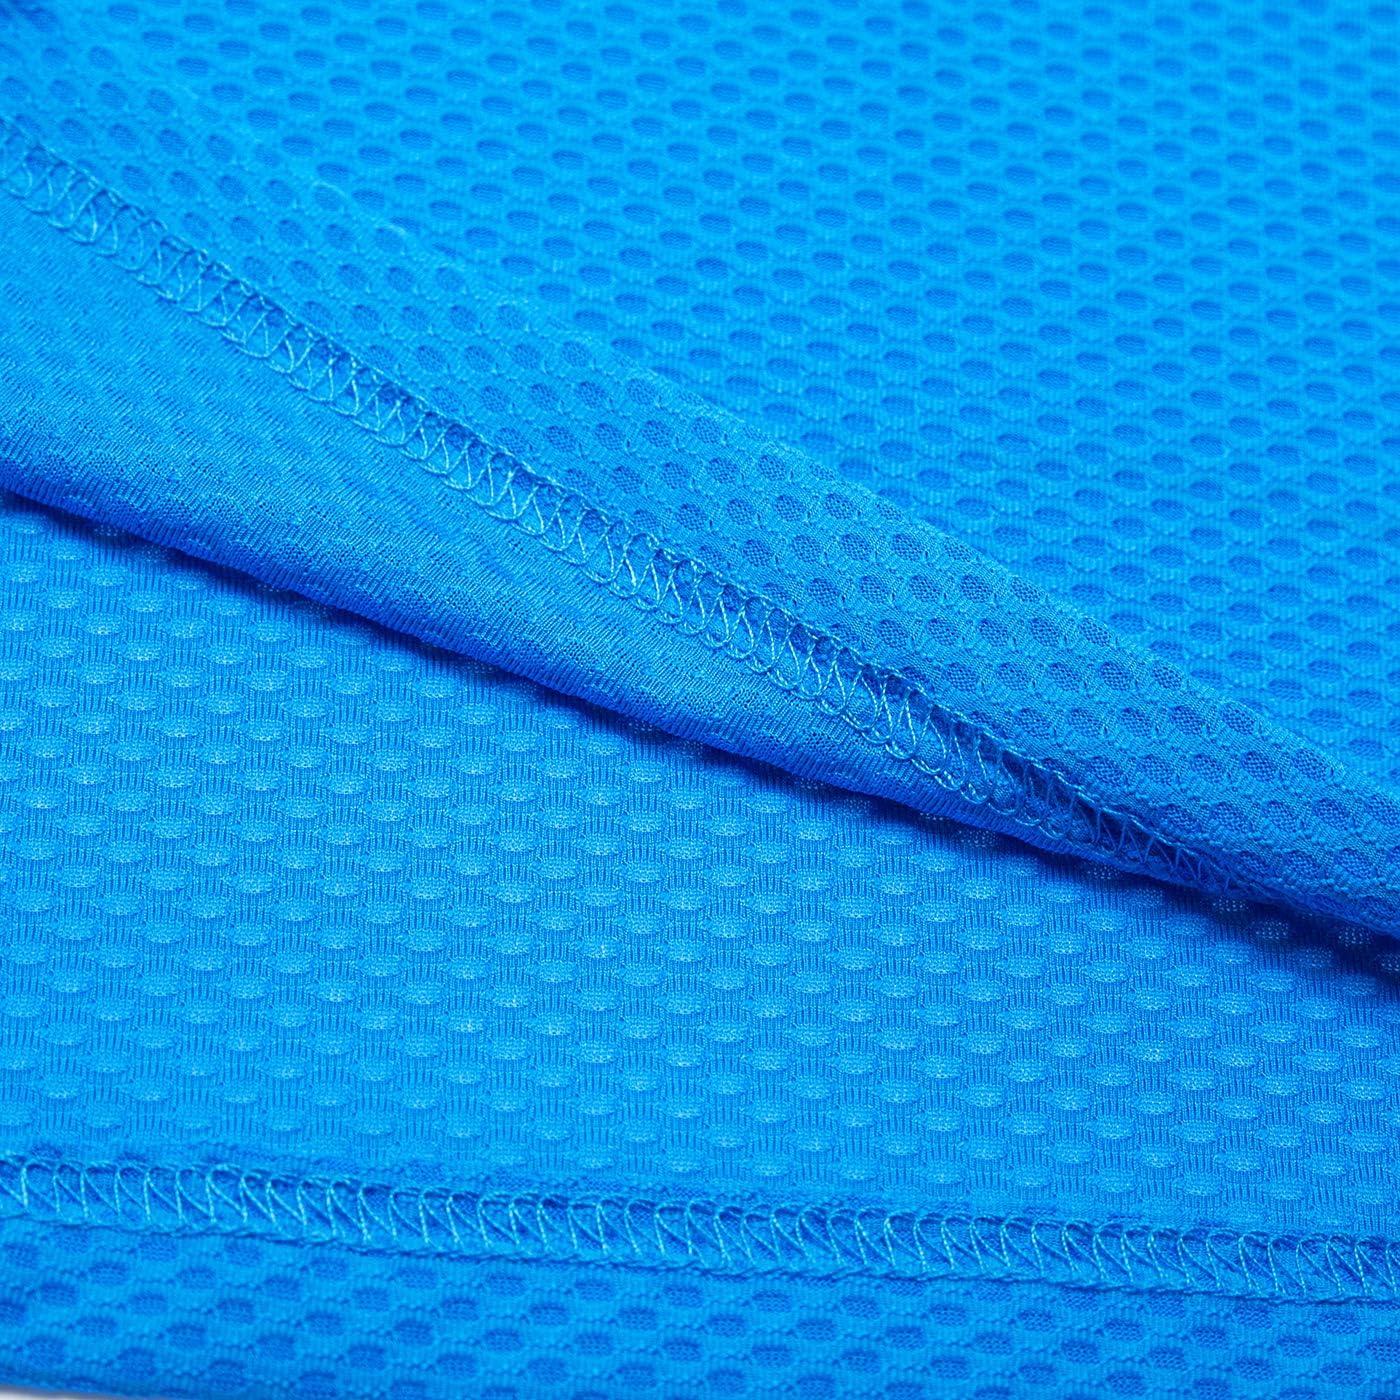 Gym Shirt Tank top for Men Athletic Sleeveless Shirt bpbtti Mens Sleeveless Cycling Baselayer Biking Undershirt